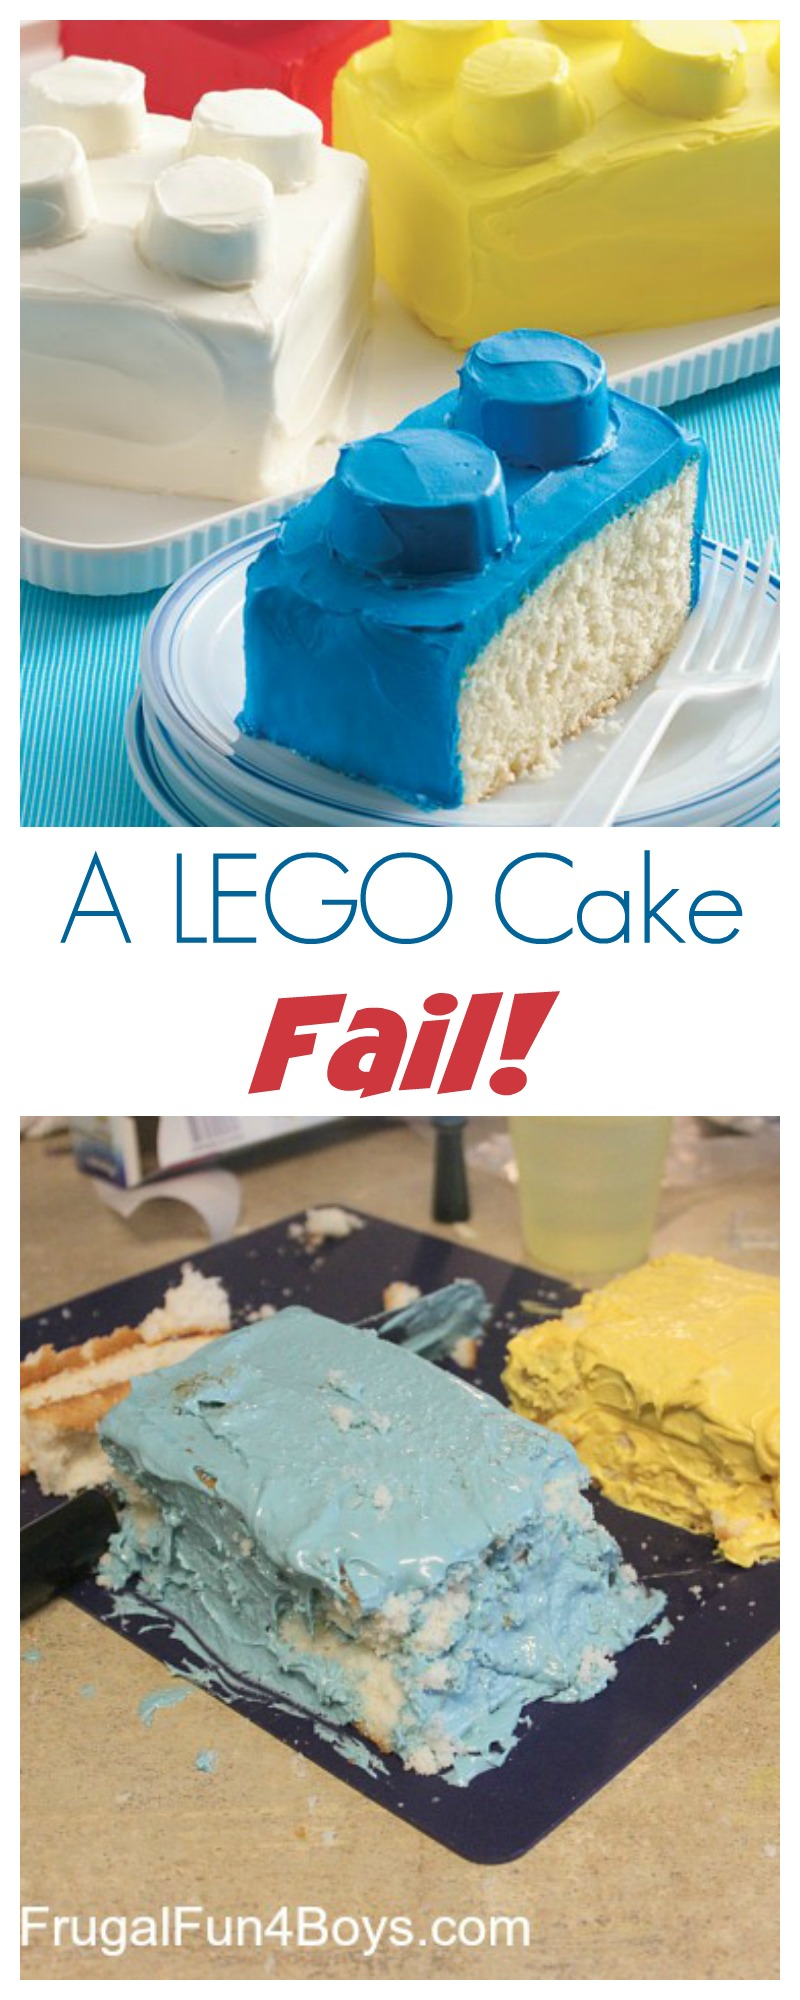 A LEGO Cake FAIL!!